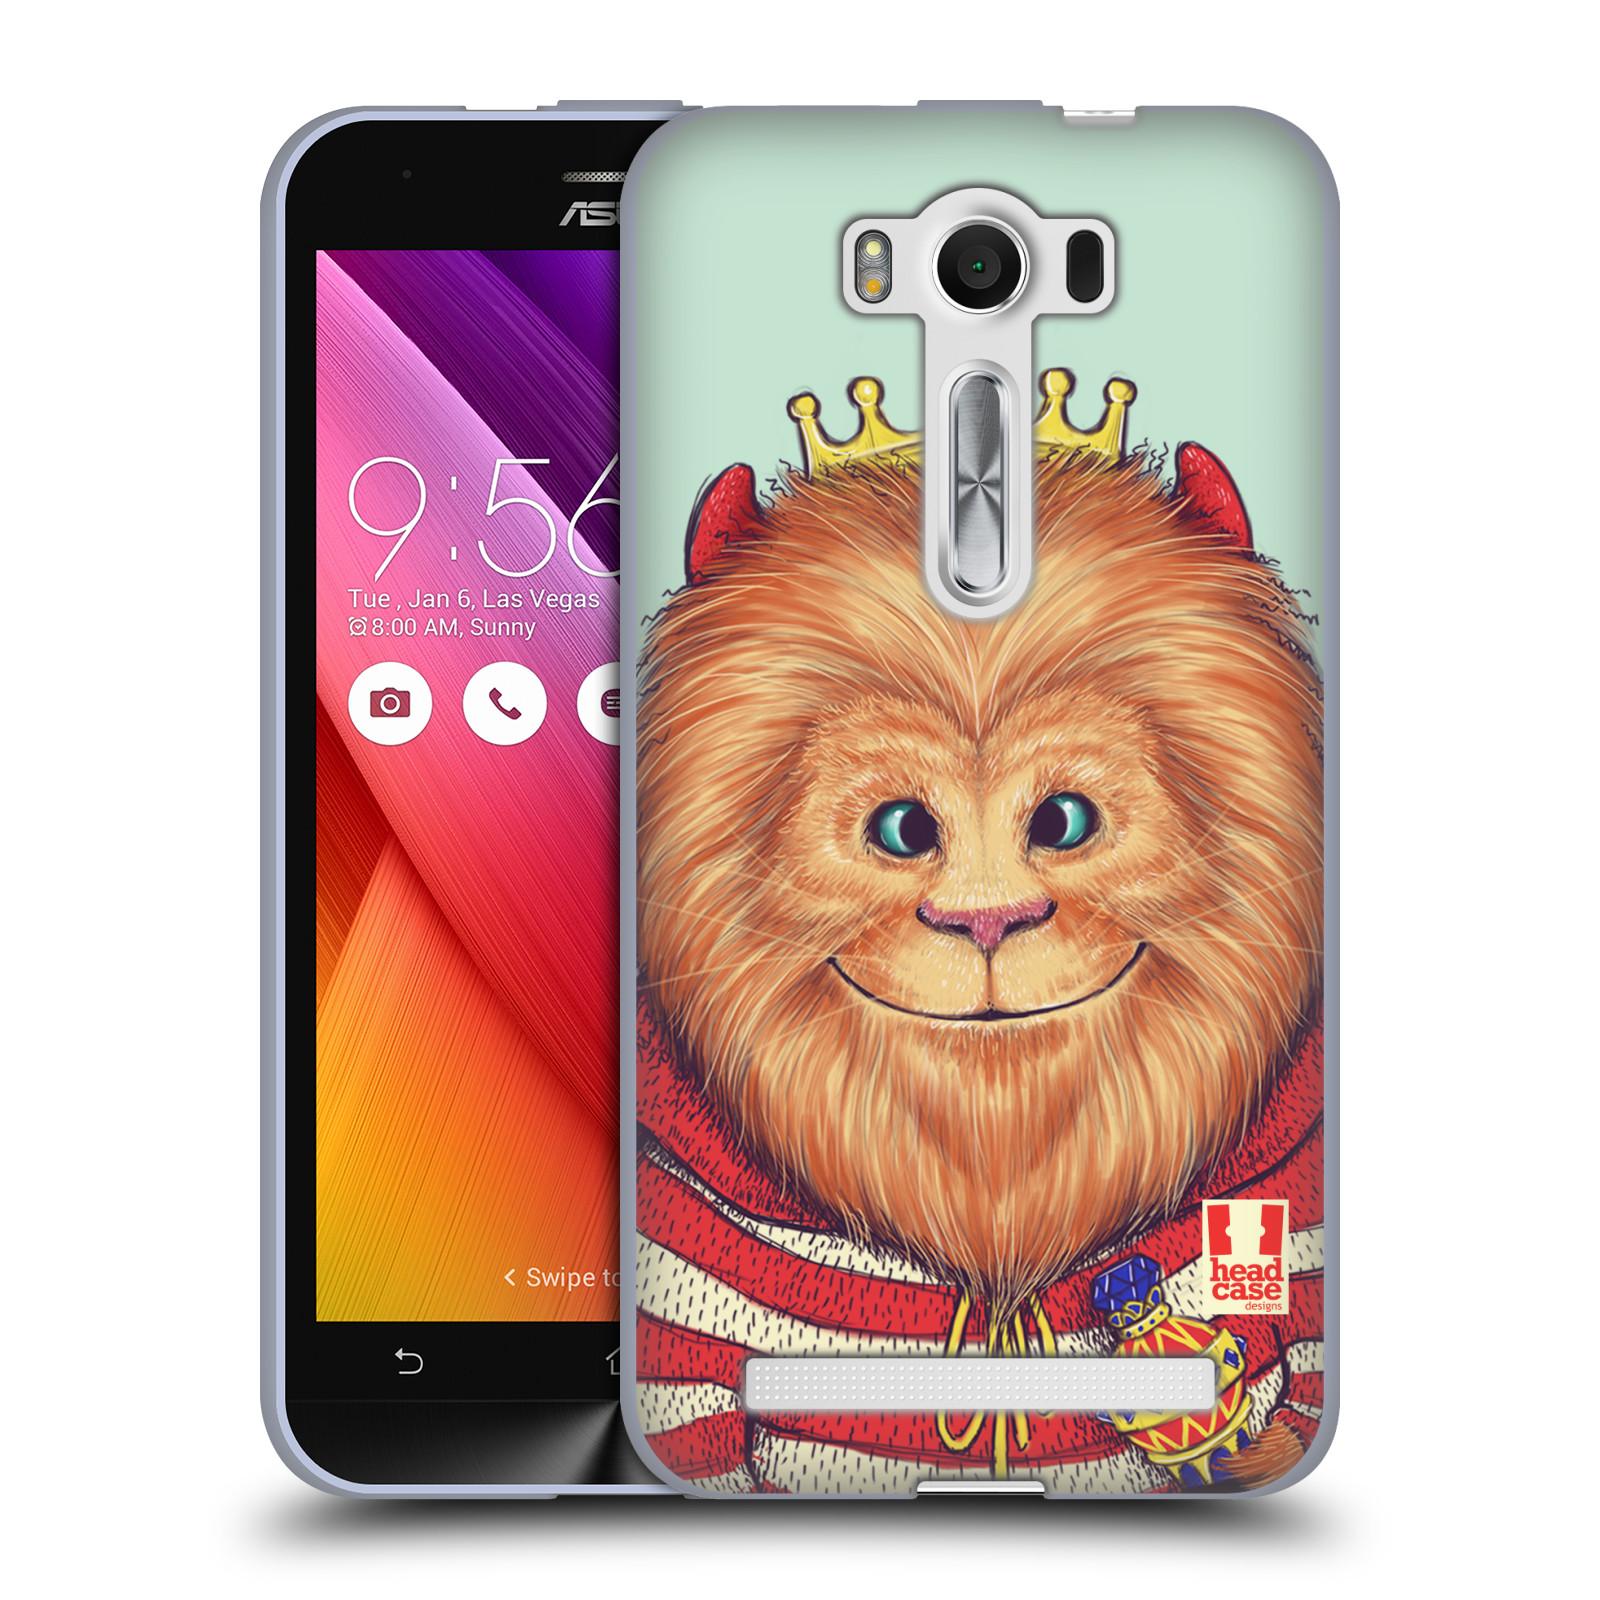 "HEAD CASE silikonový obal na mobil Asus Zenfone 2 LASER (ZE500KL s 5"" displejem) vzor Kreslená zvířátka lev"